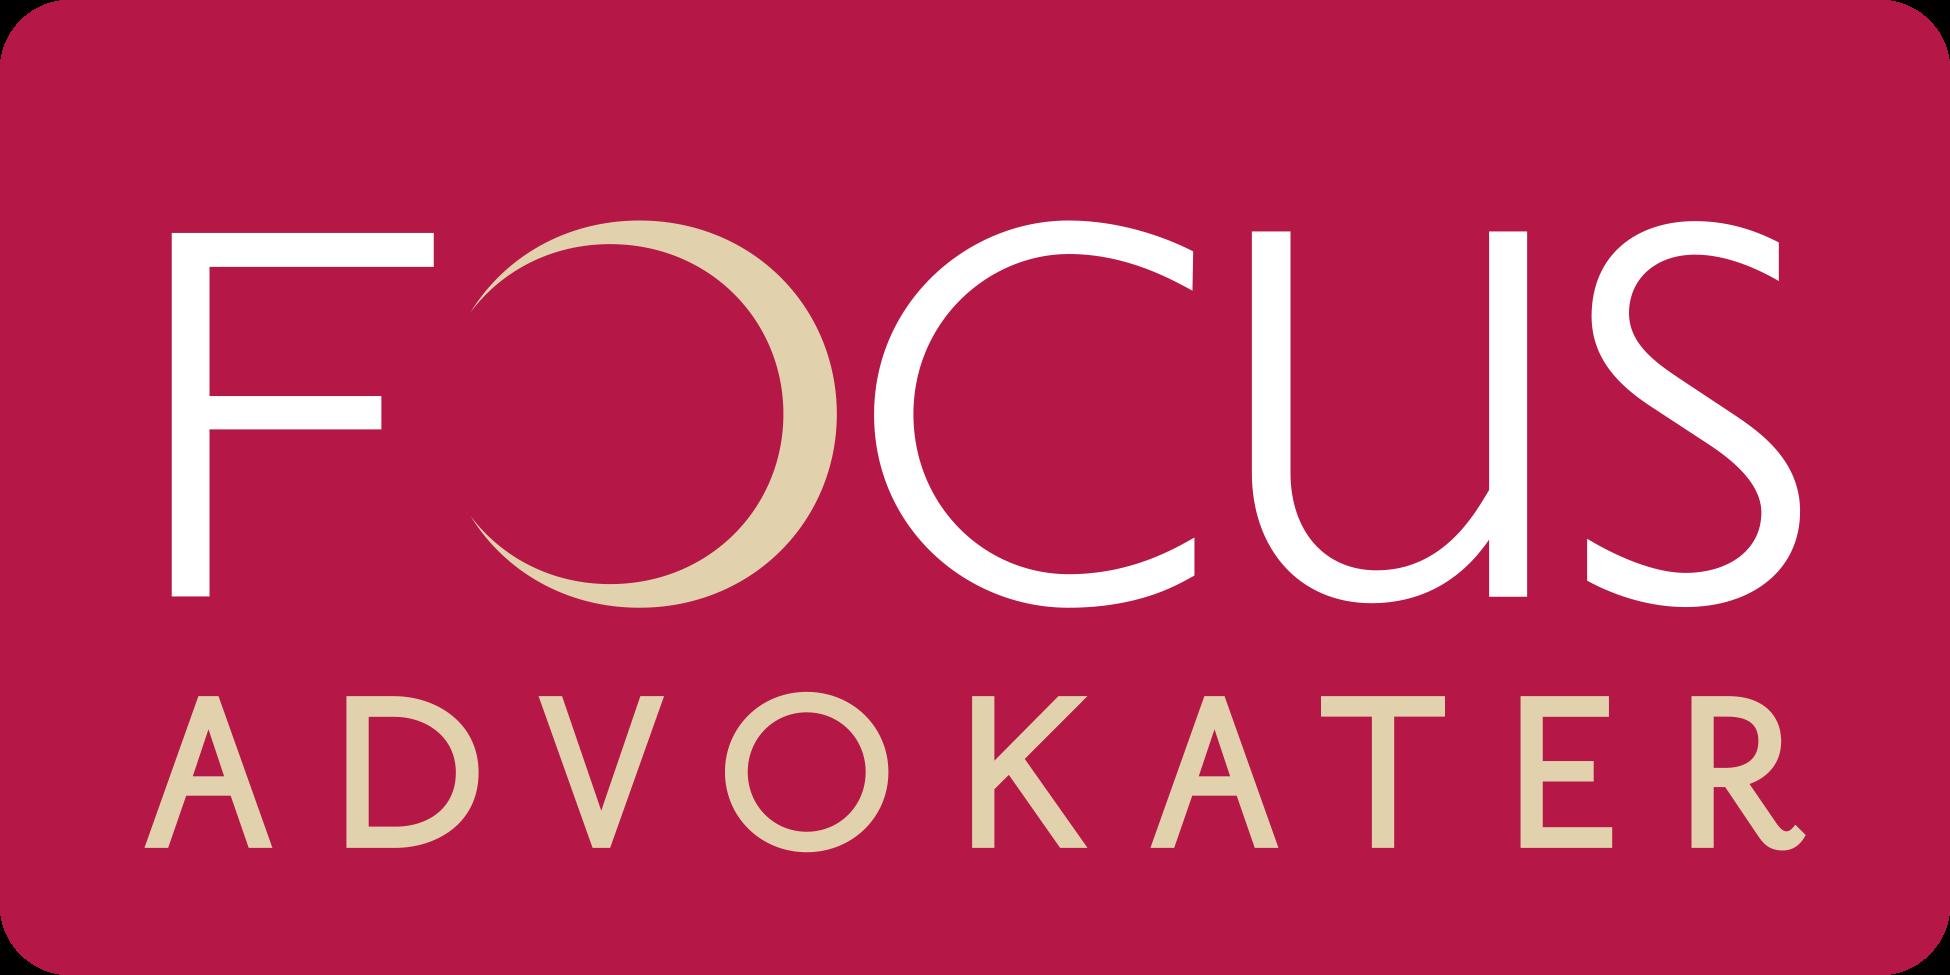 Focus Advokater logo